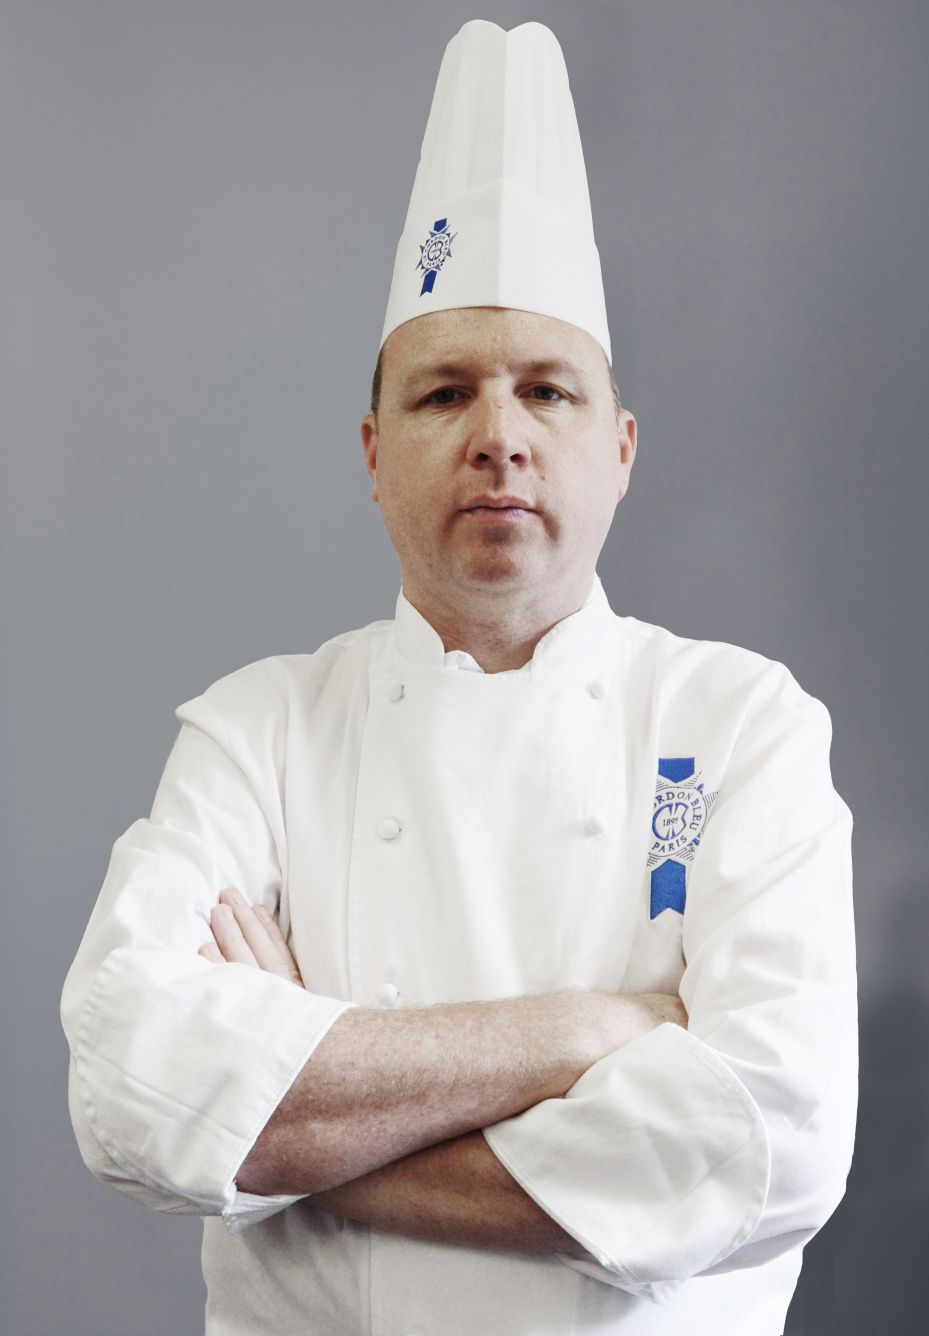 ChefColinWestal